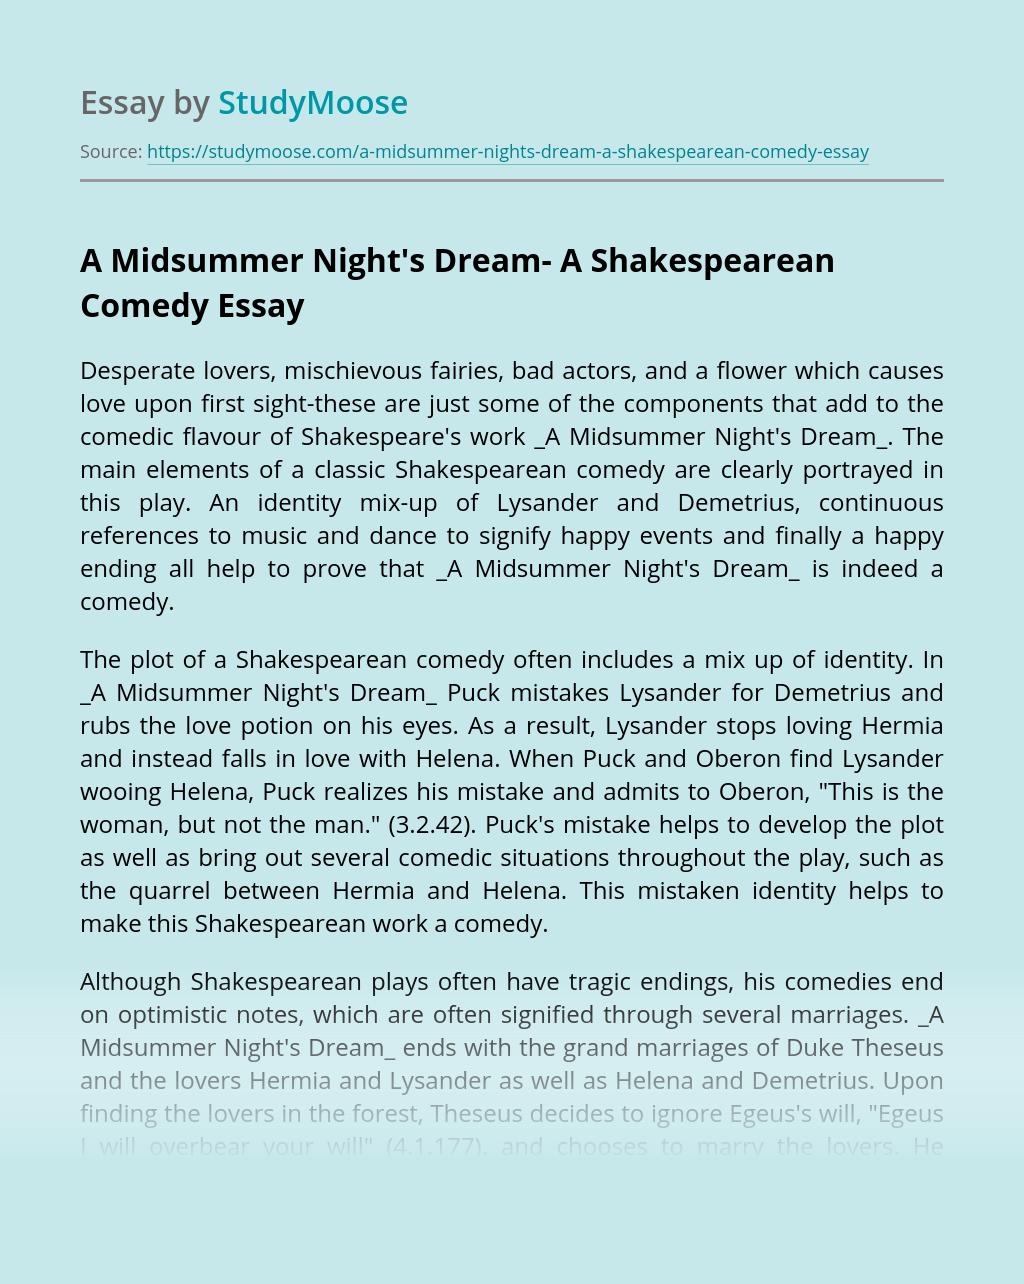 A Midsummer Night's Dream- A Shakespearean Comedy